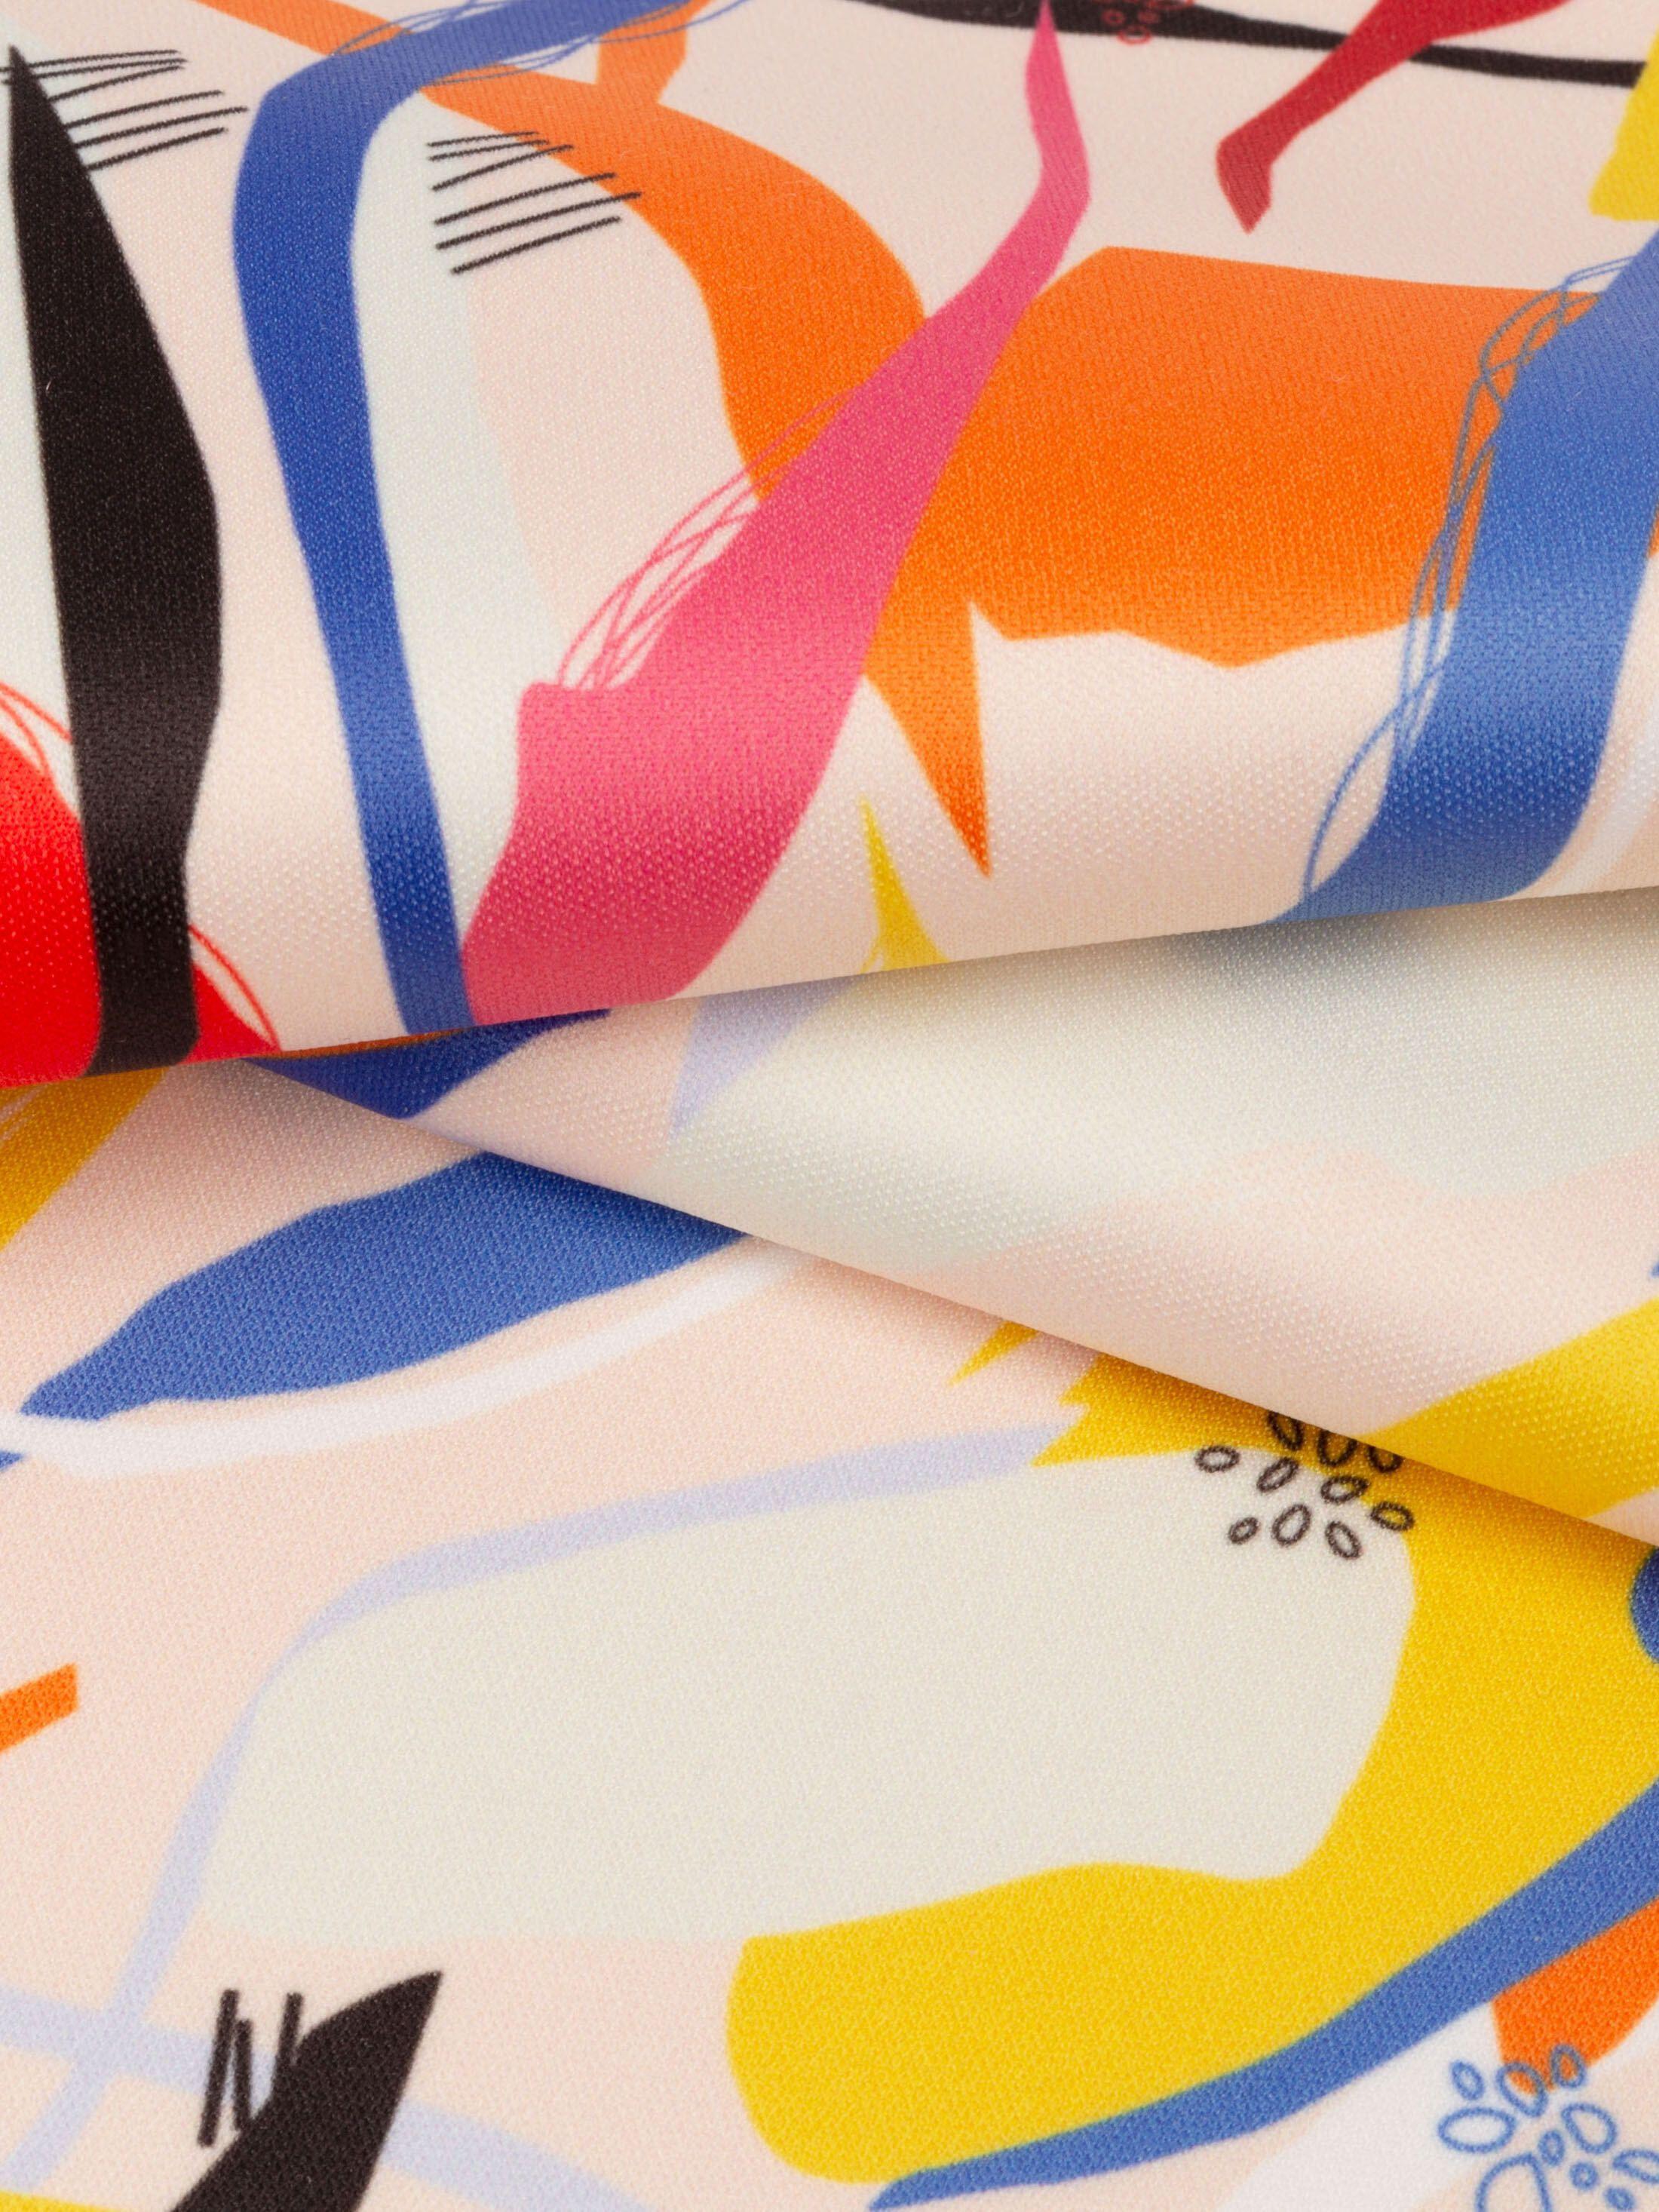 softshell jersey fabric printing